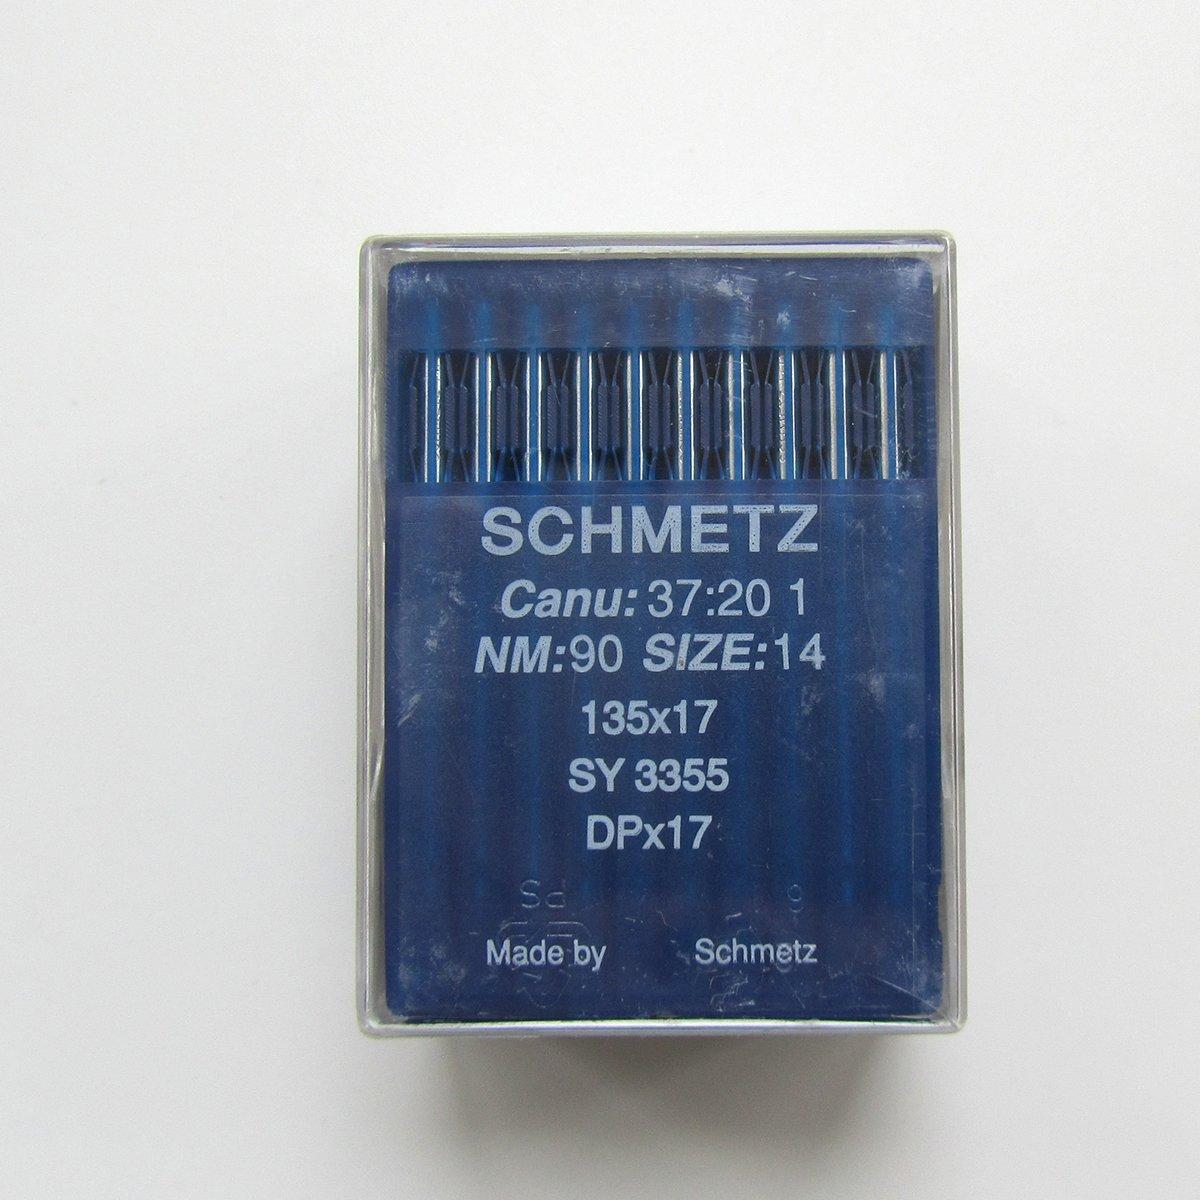 50 SCHMETZ 24 135X17 DPX17 SY3355 INDUSTRIAL SEWING MACHINE NEEDLES WALKING FOOT